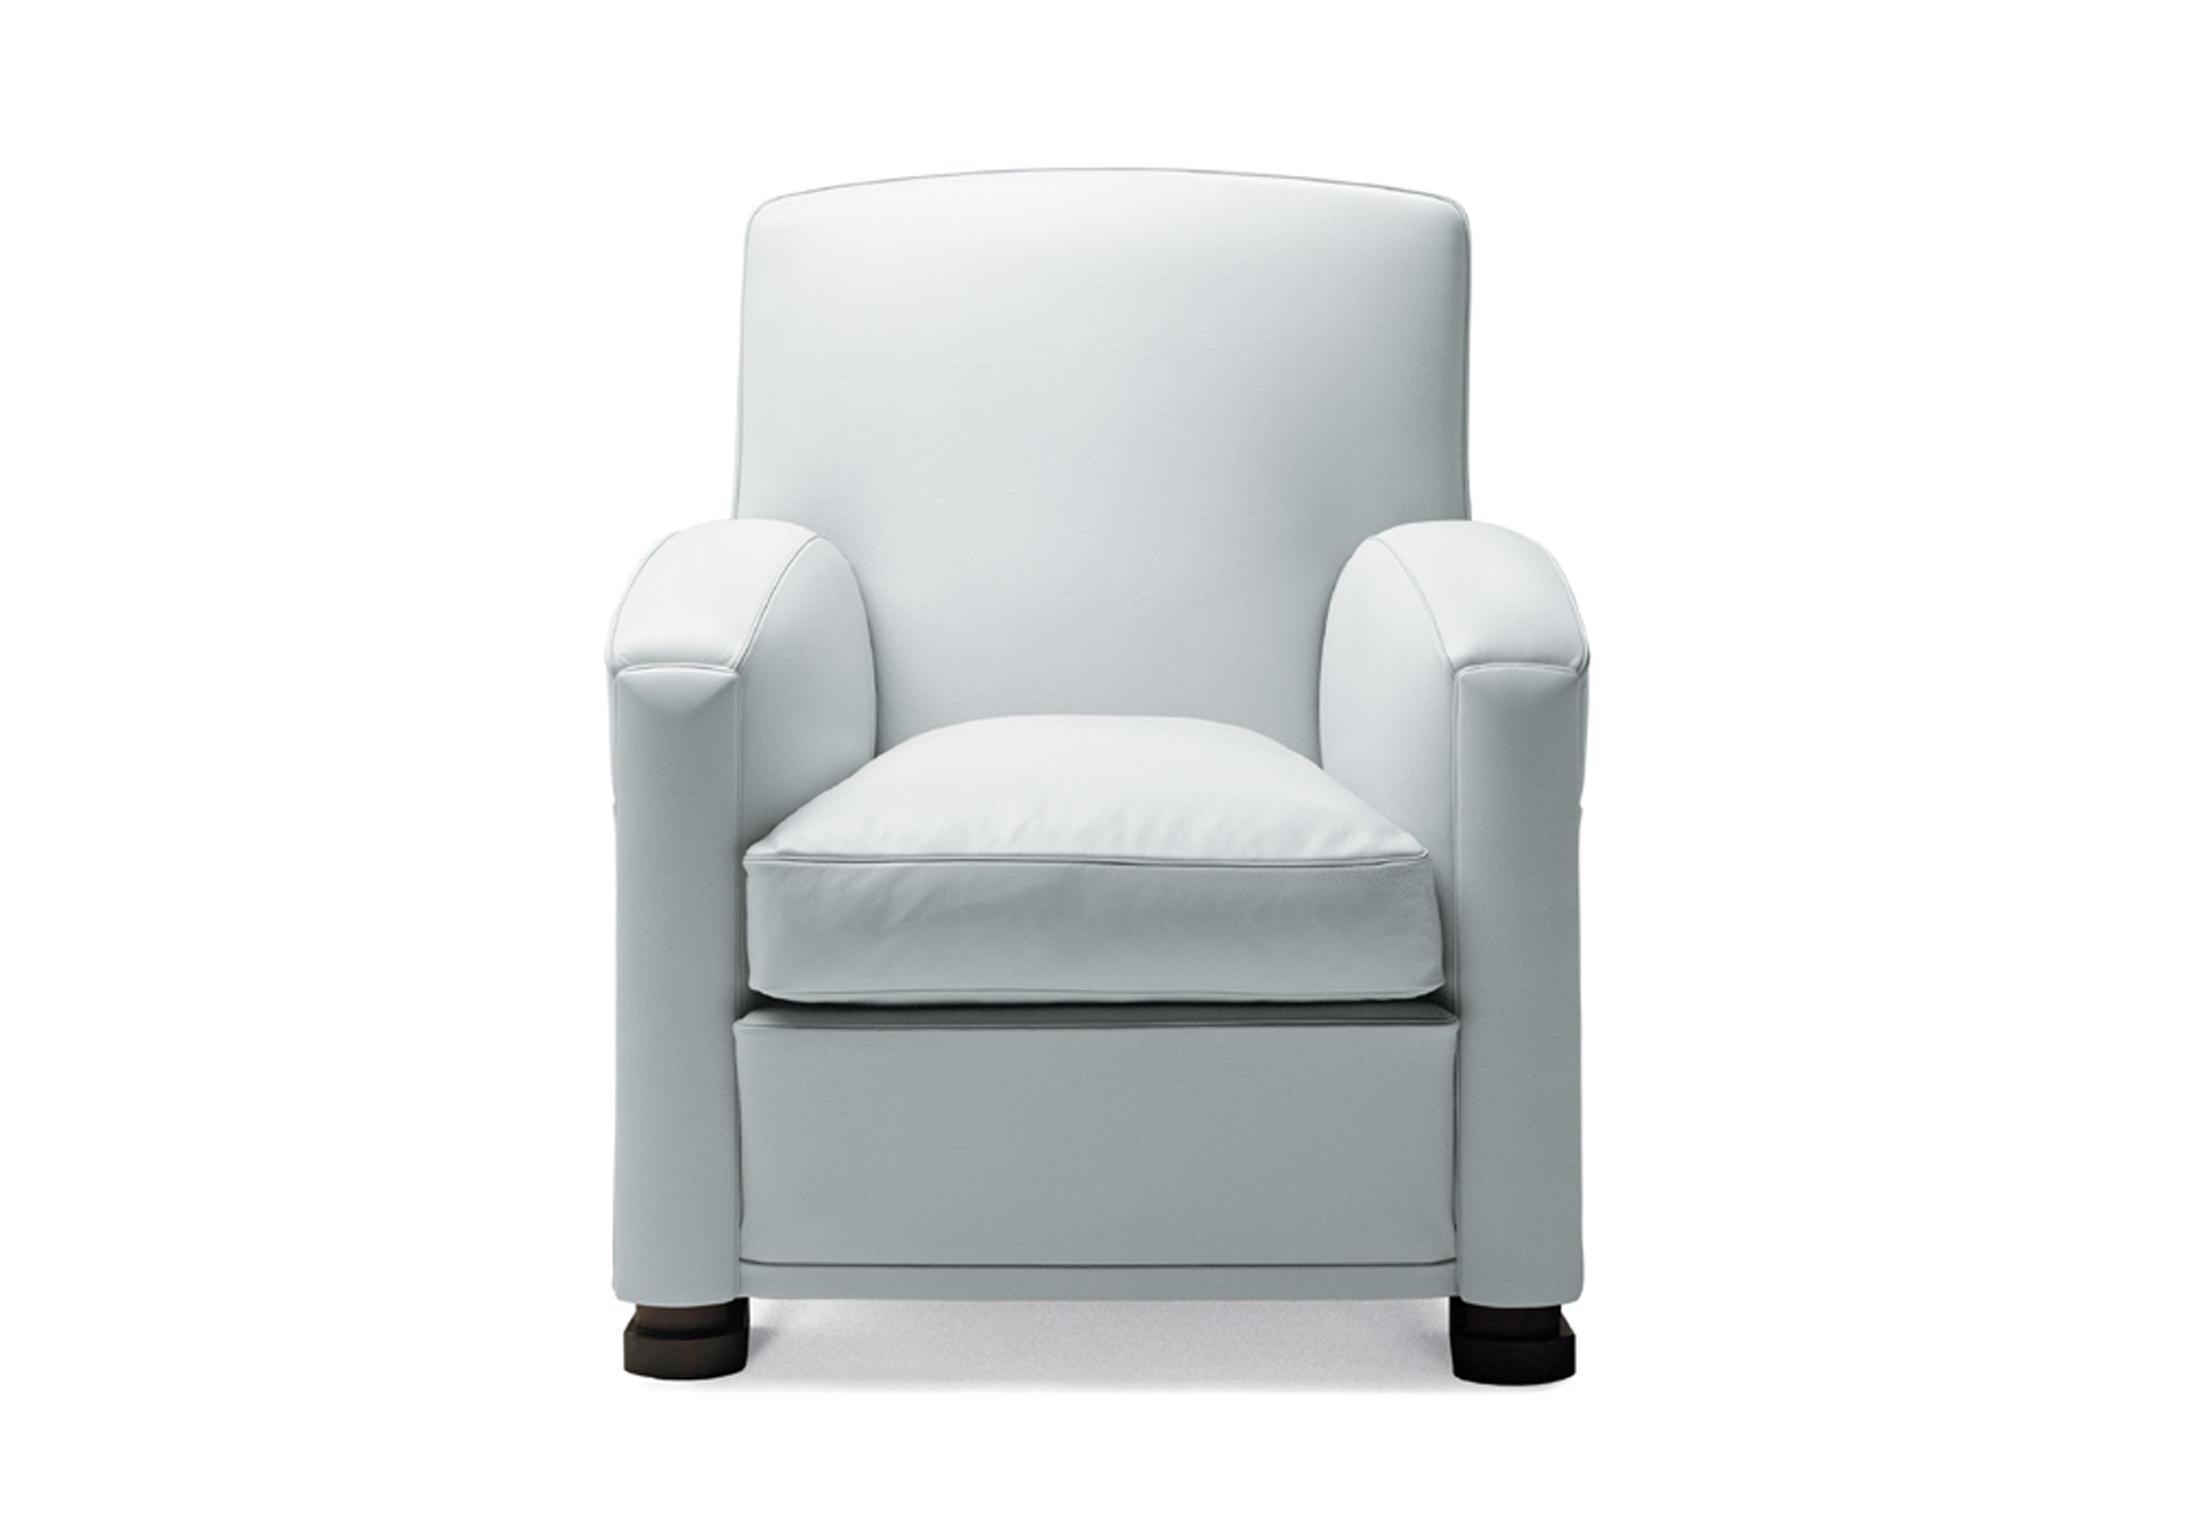 tabarin sessel von poltrona frau stylepark. Black Bedroom Furniture Sets. Home Design Ideas